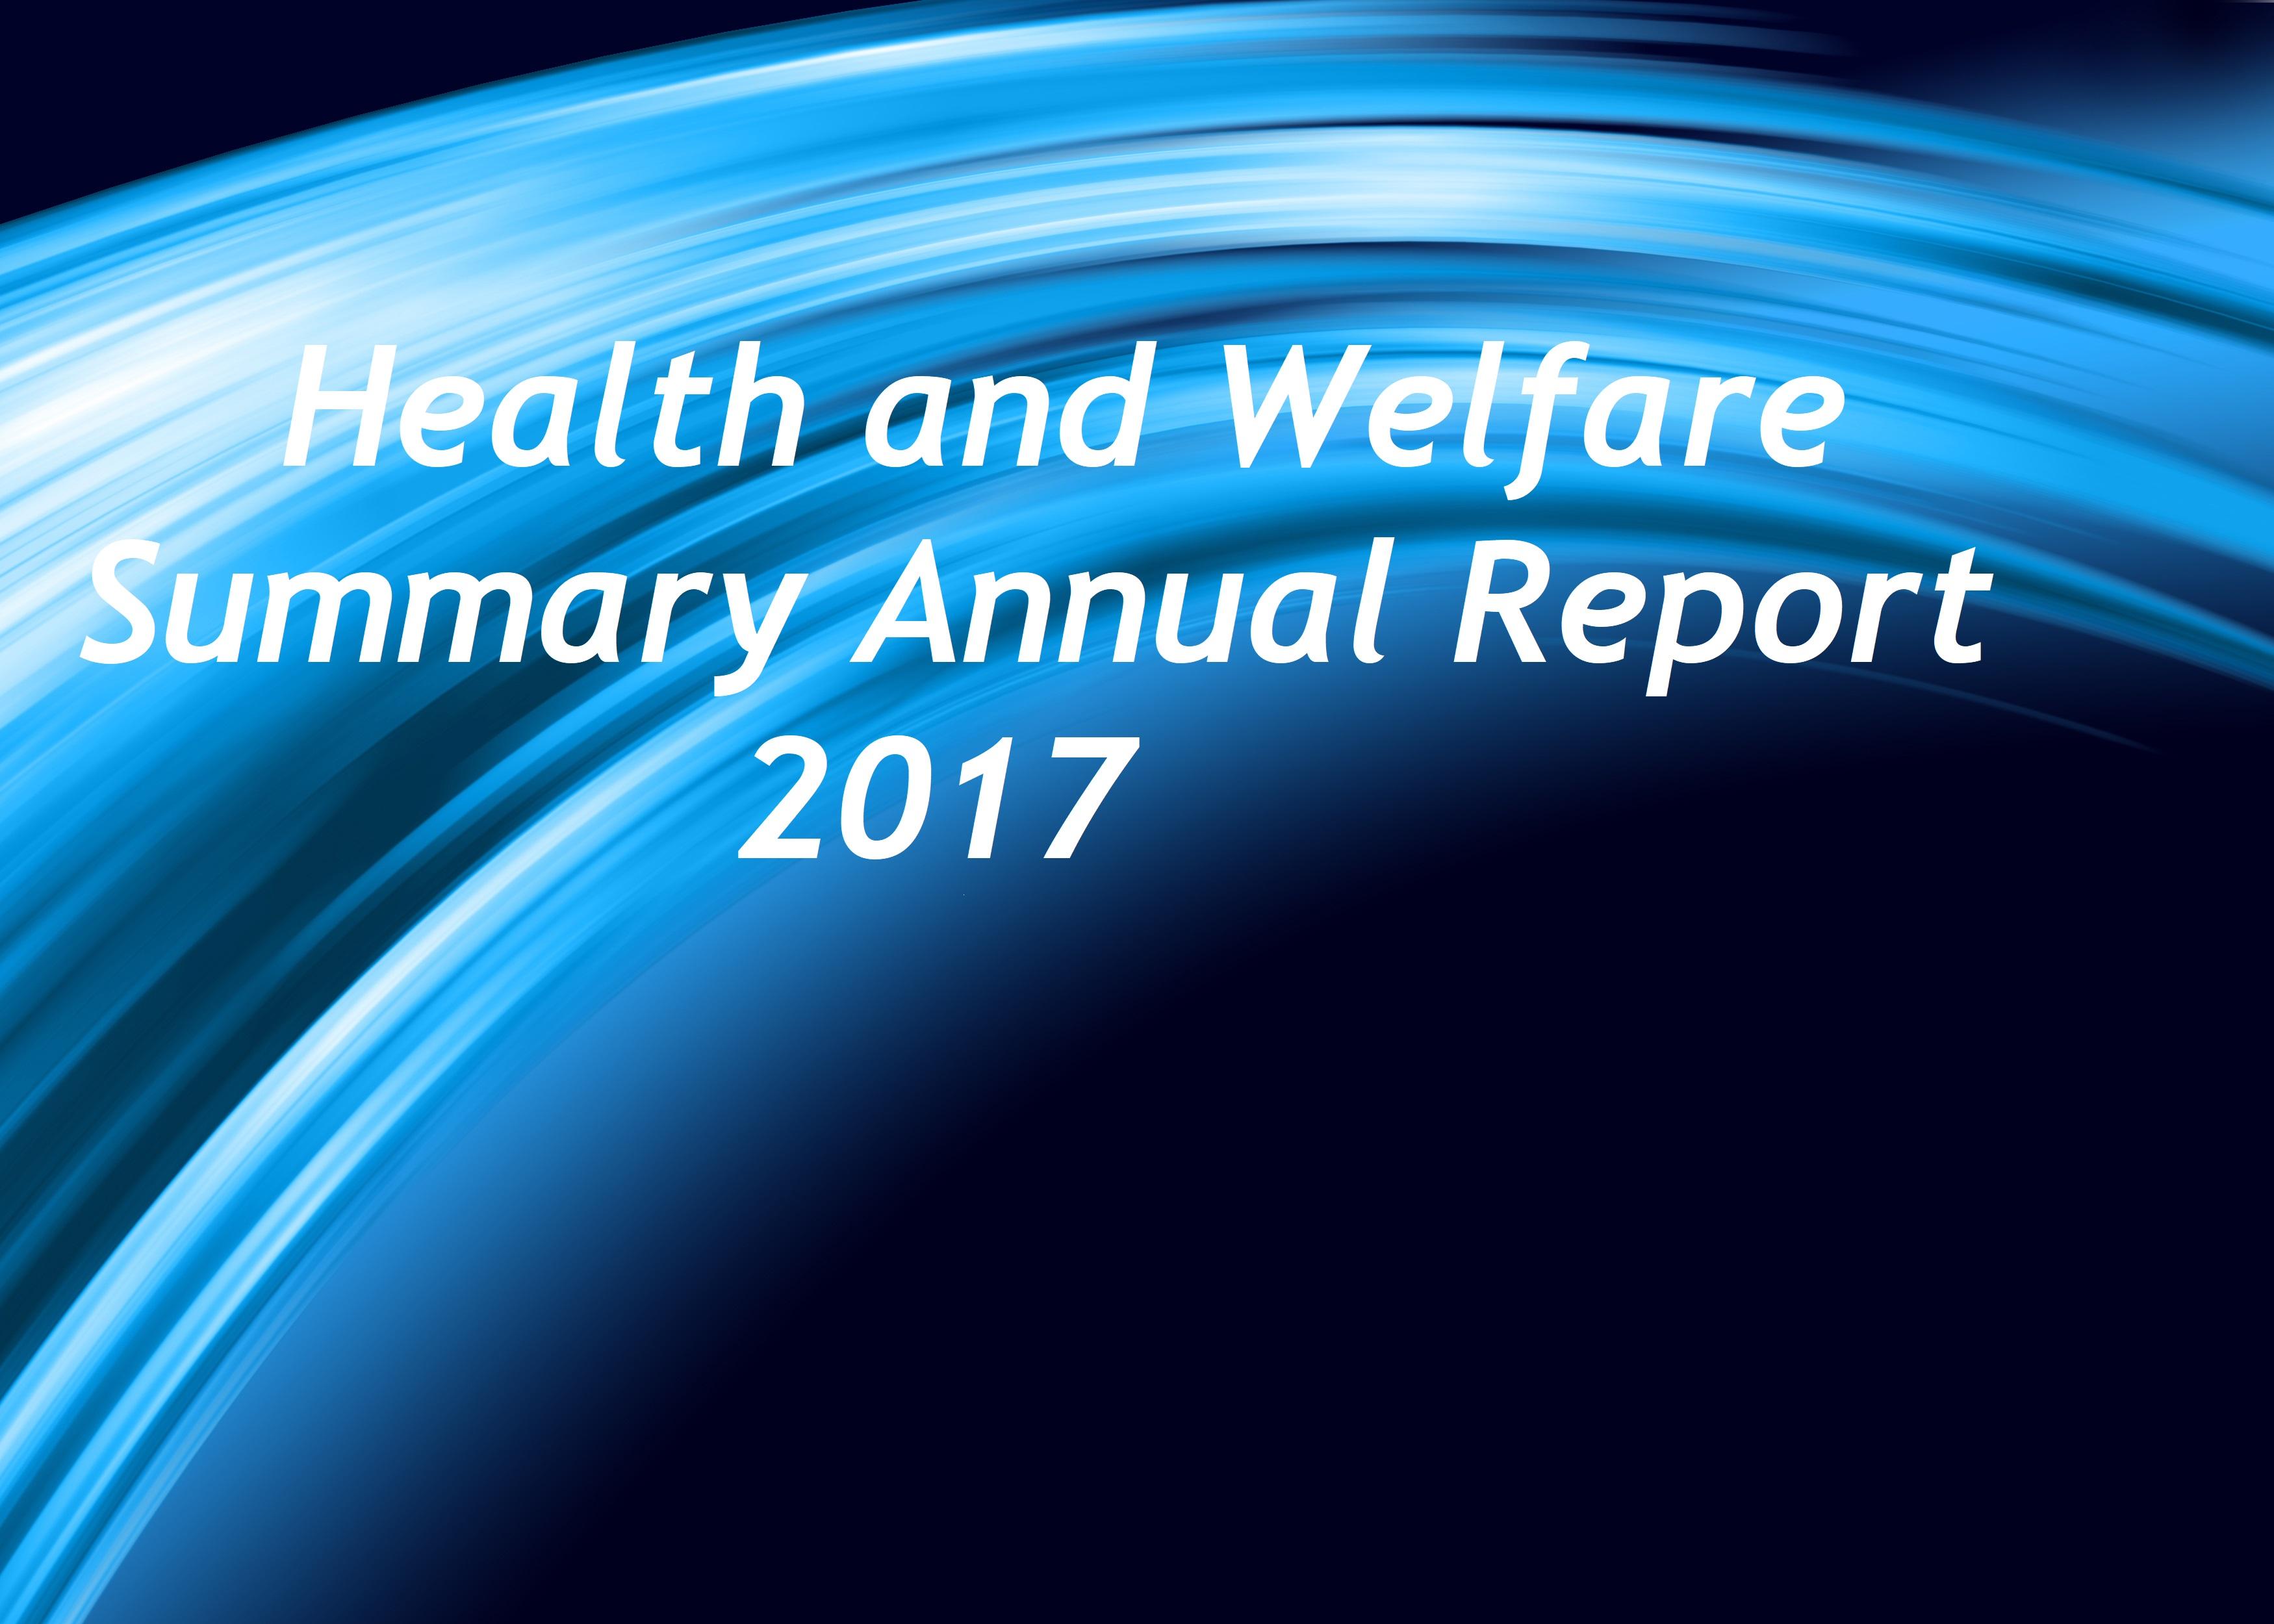 Summary Annual Report (OCU H&W Trust) Plan Year Ending 12/31/2017- October 15, 2018